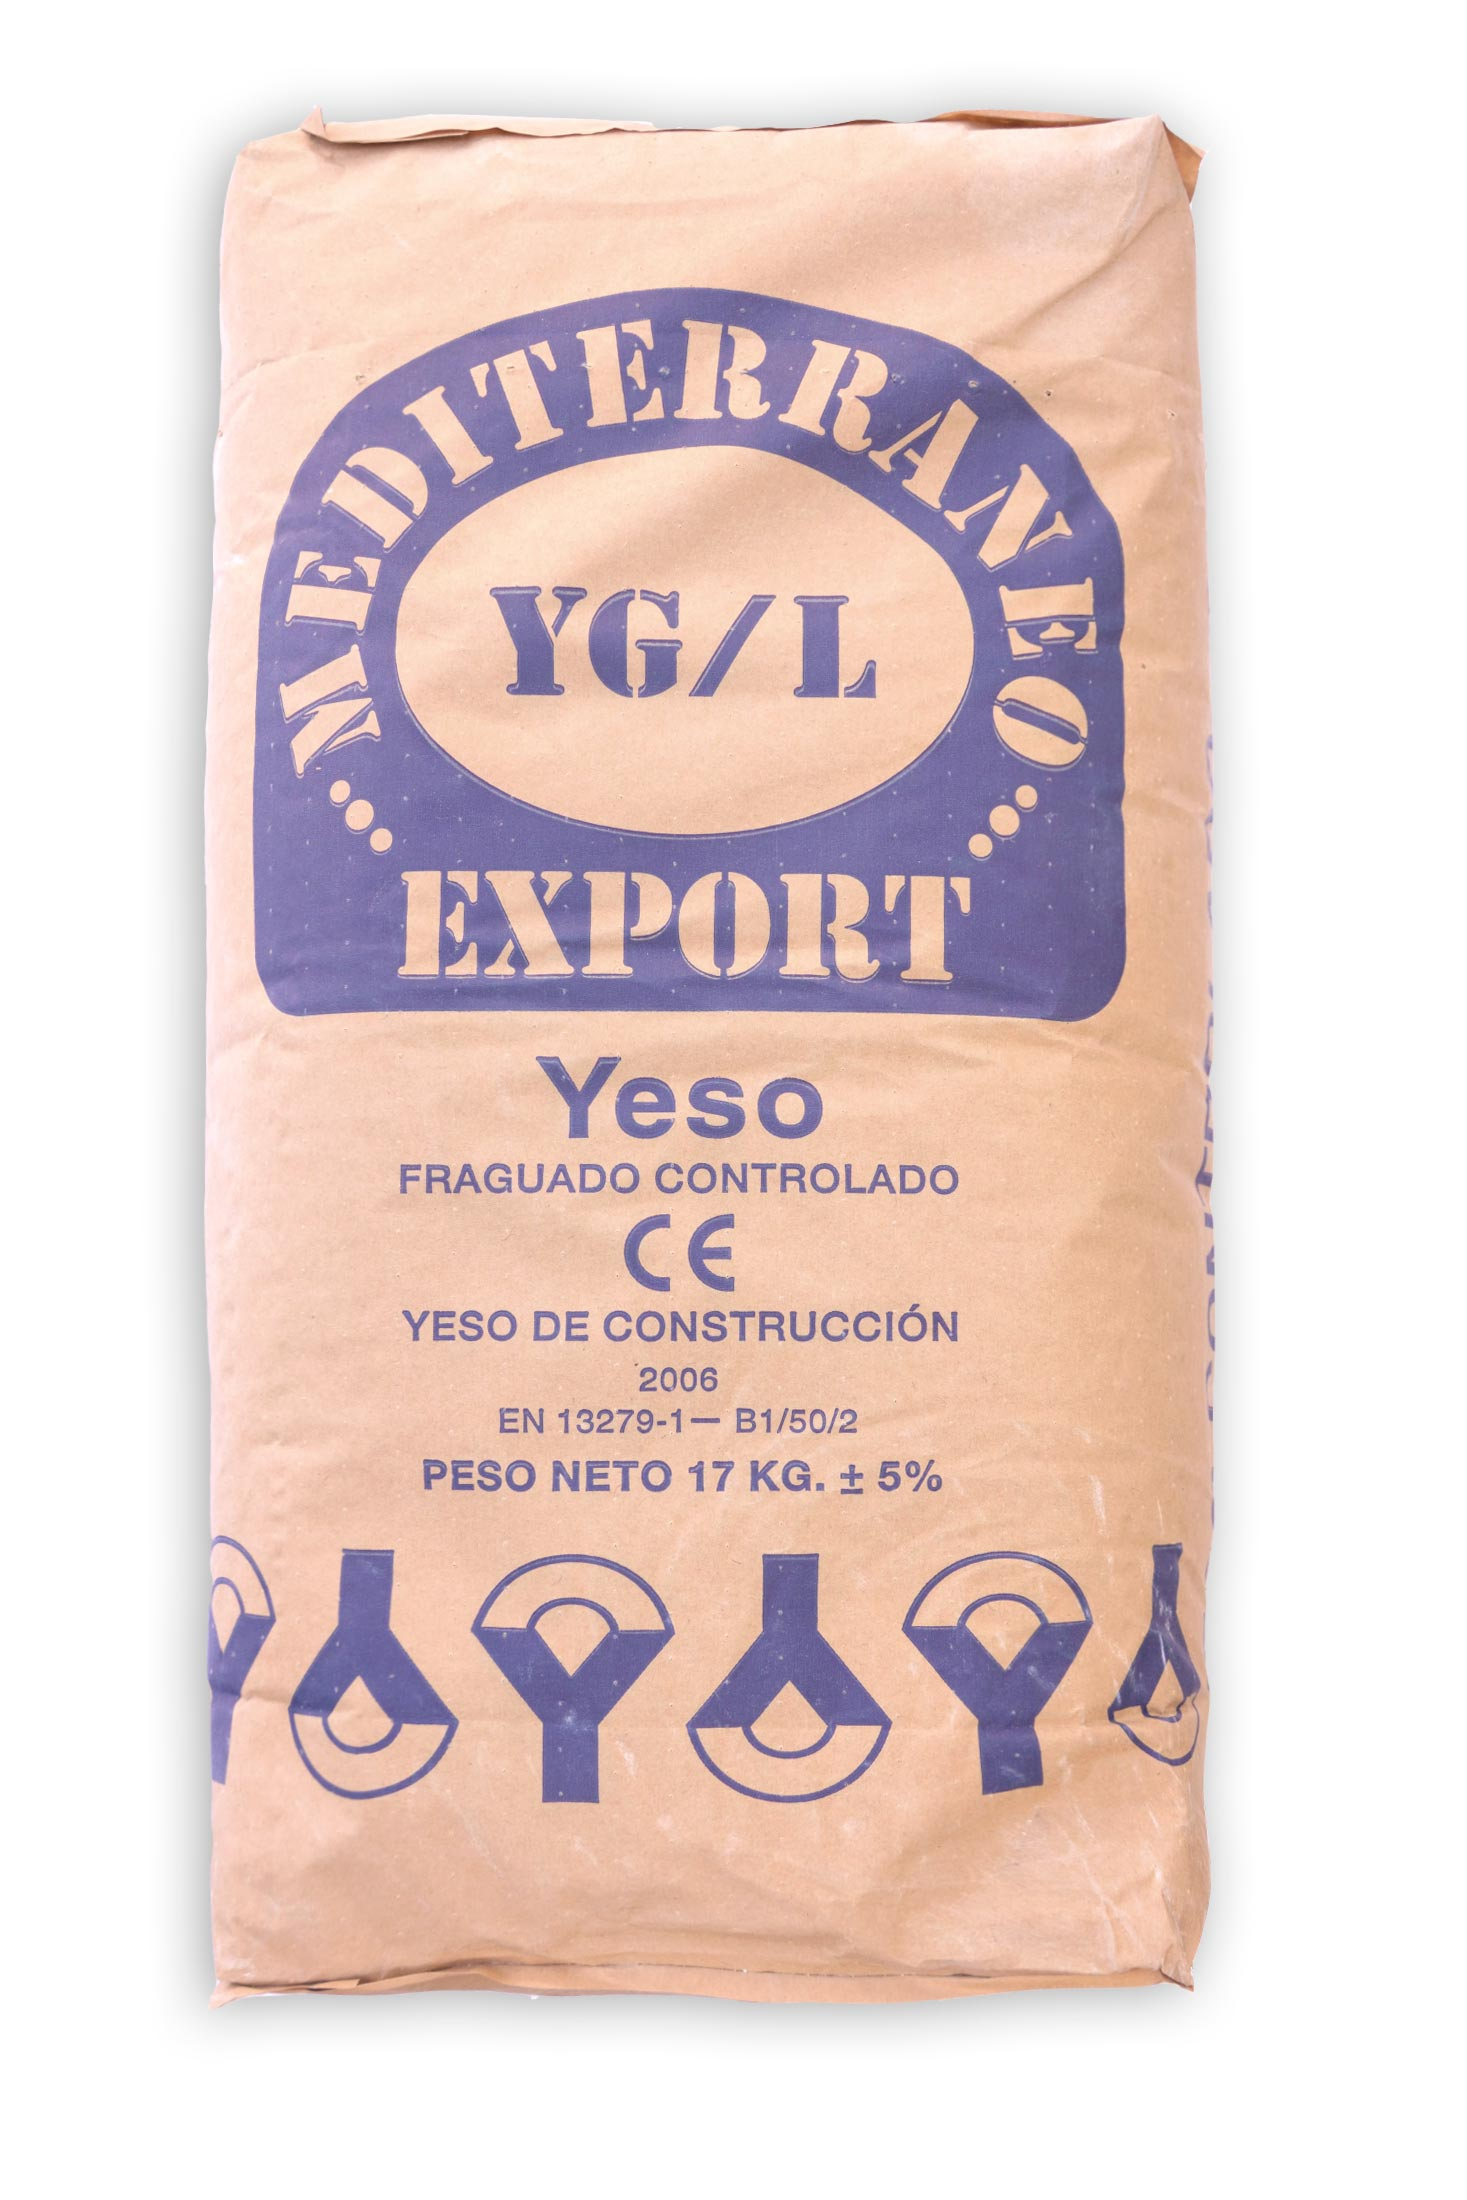 Yeso de fraguado controlado - Mediterráneo